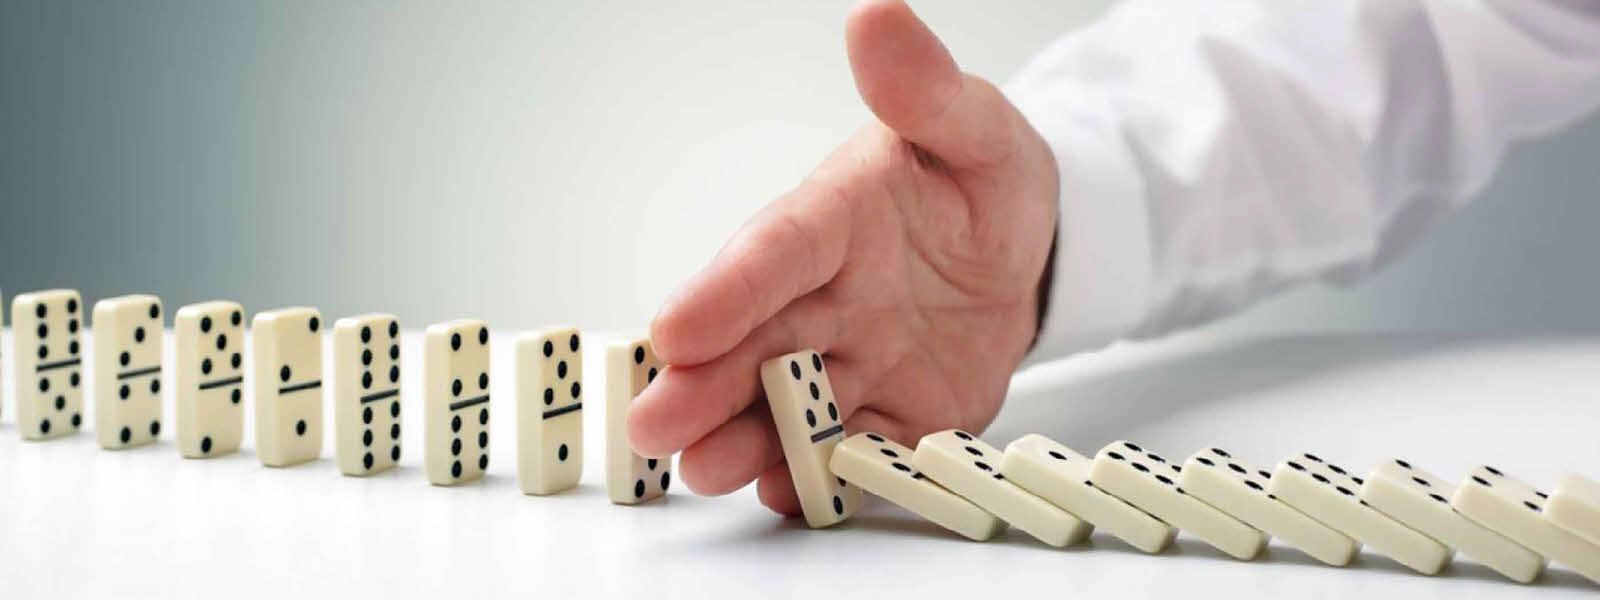 Channel Partner Incentive Program Implementation Mistakes